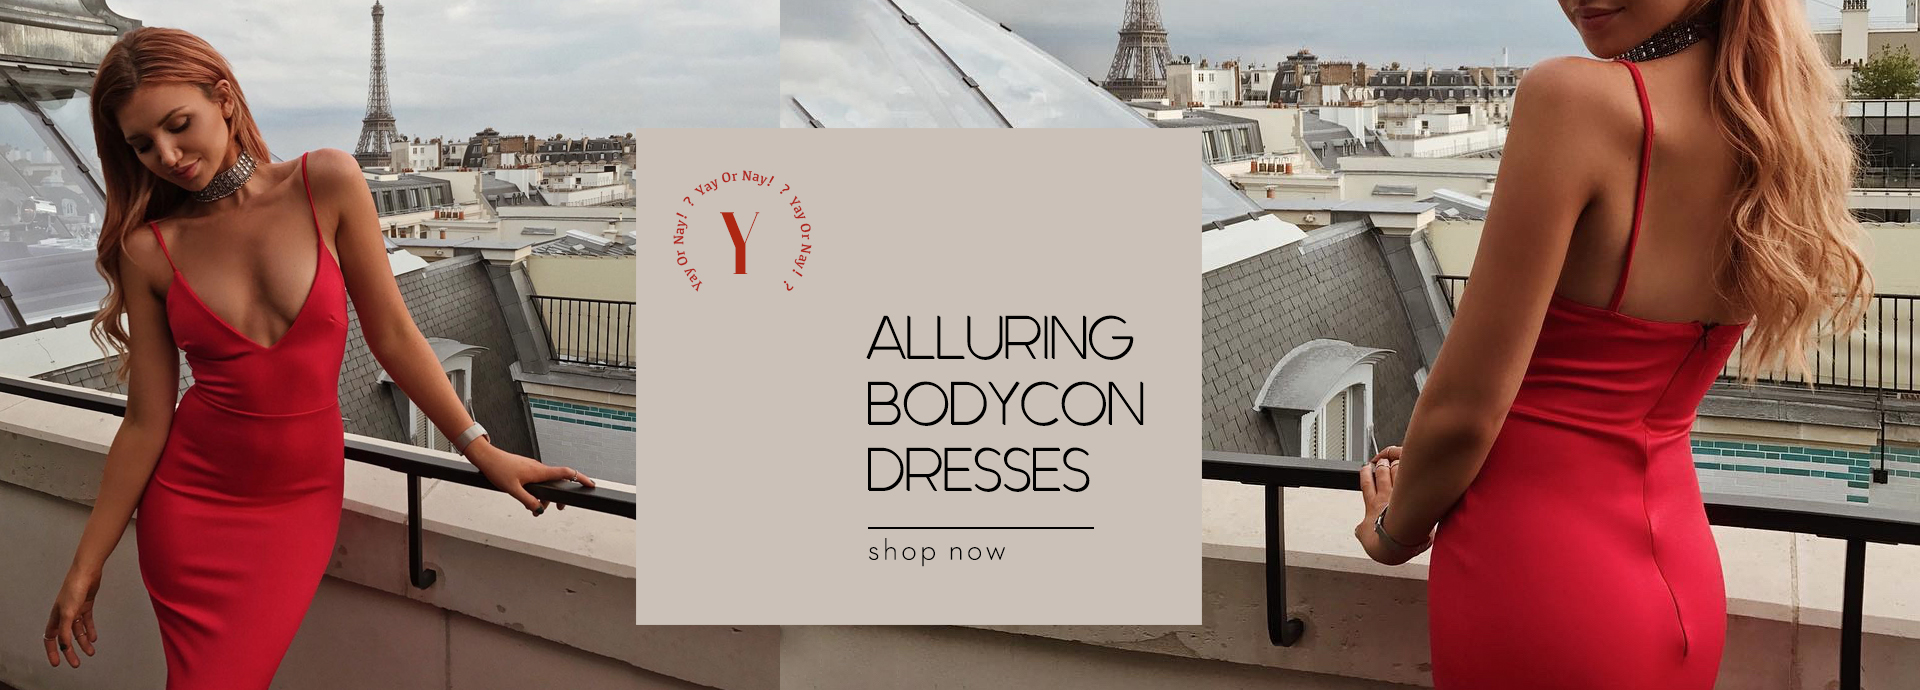 Alluring Bodycon Dresses